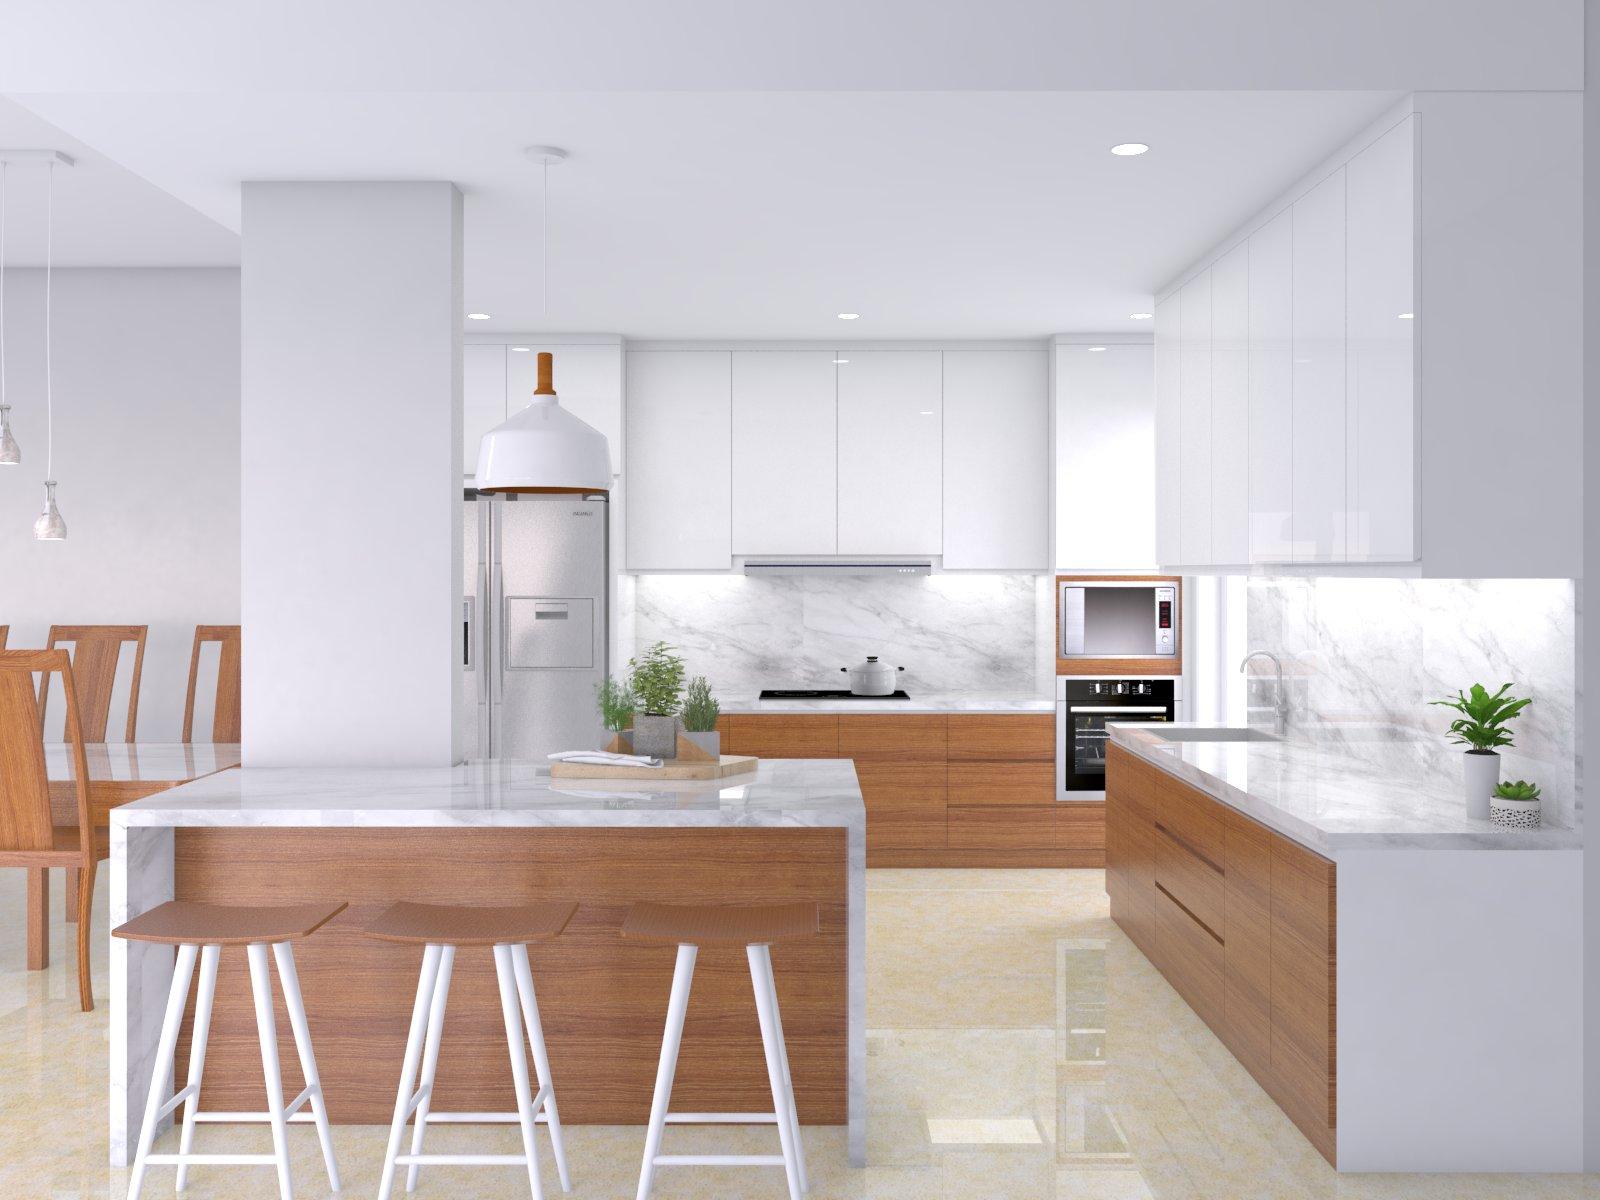 Kitchen Set View